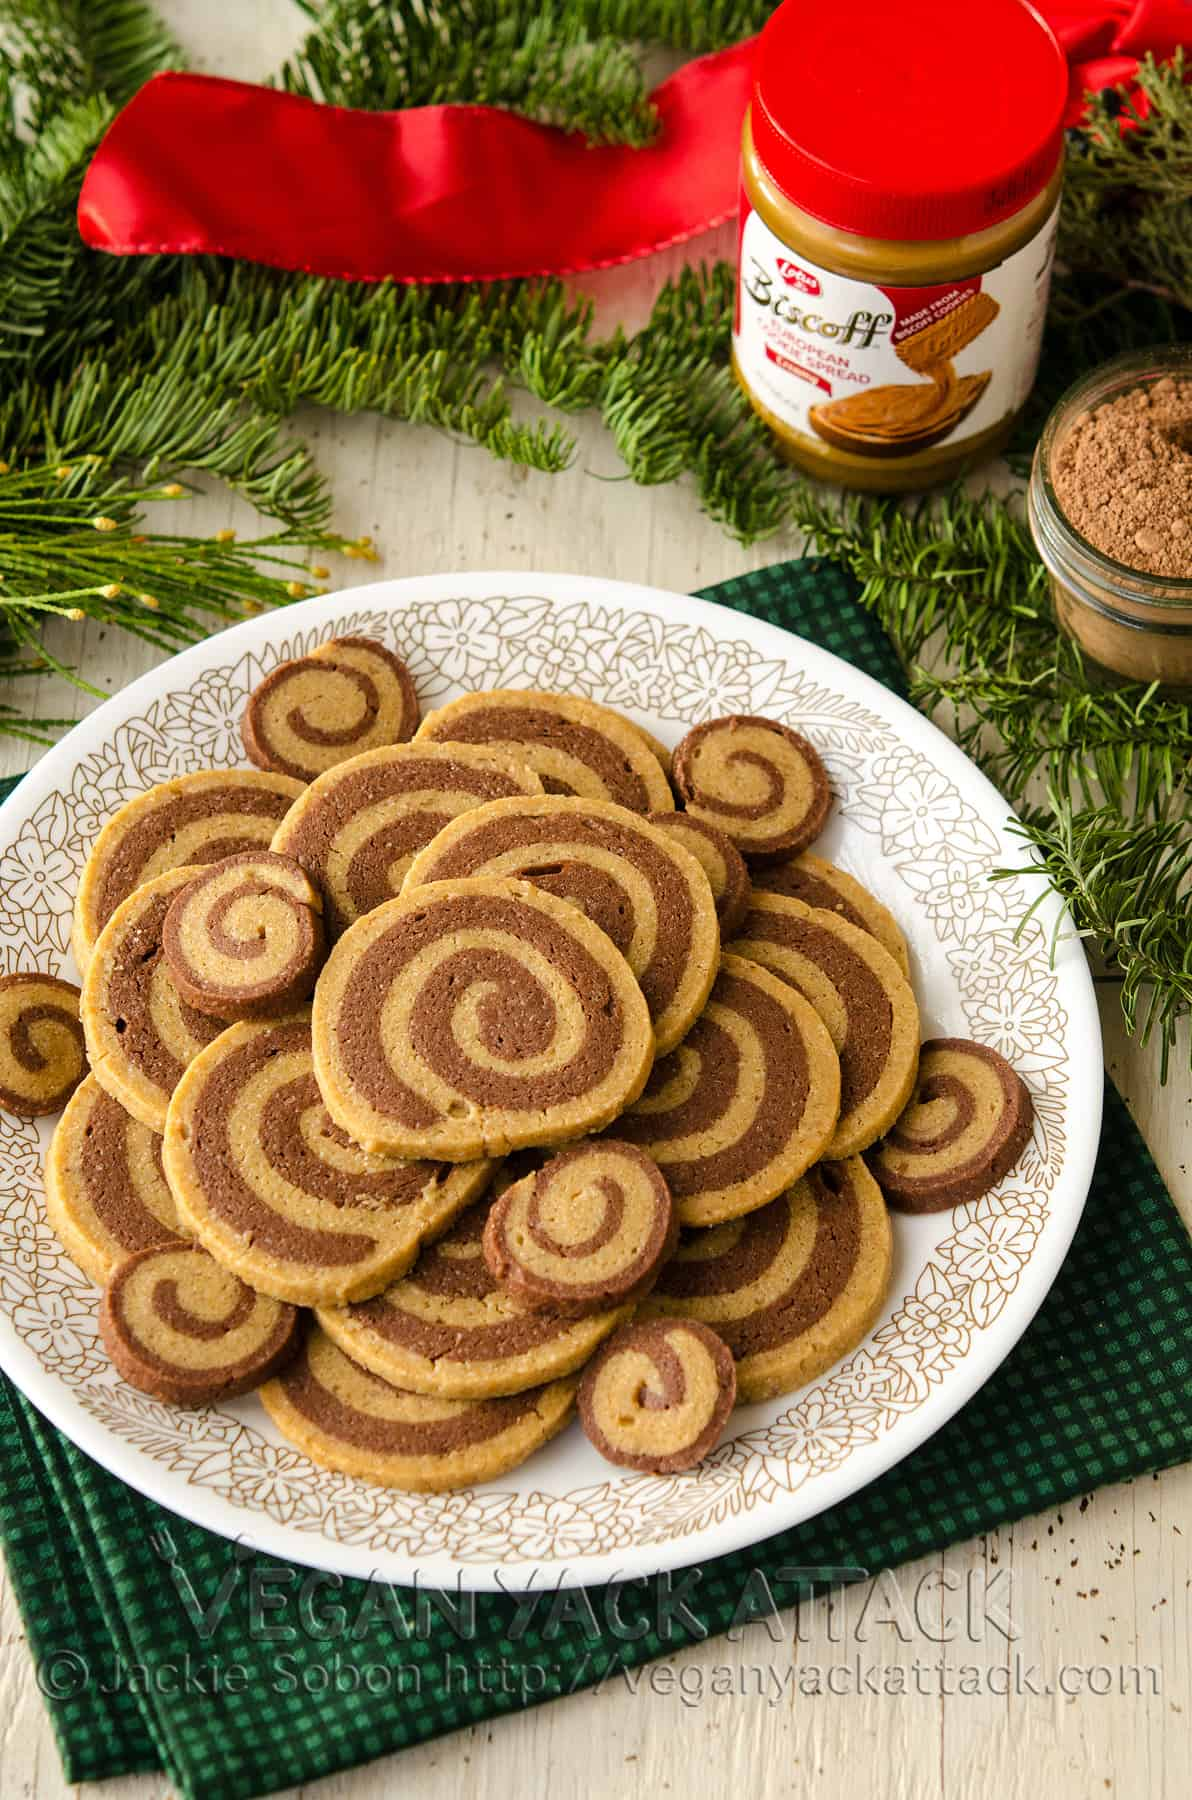 Vegan Chocolate Biscoff Pinwheel Cookies!